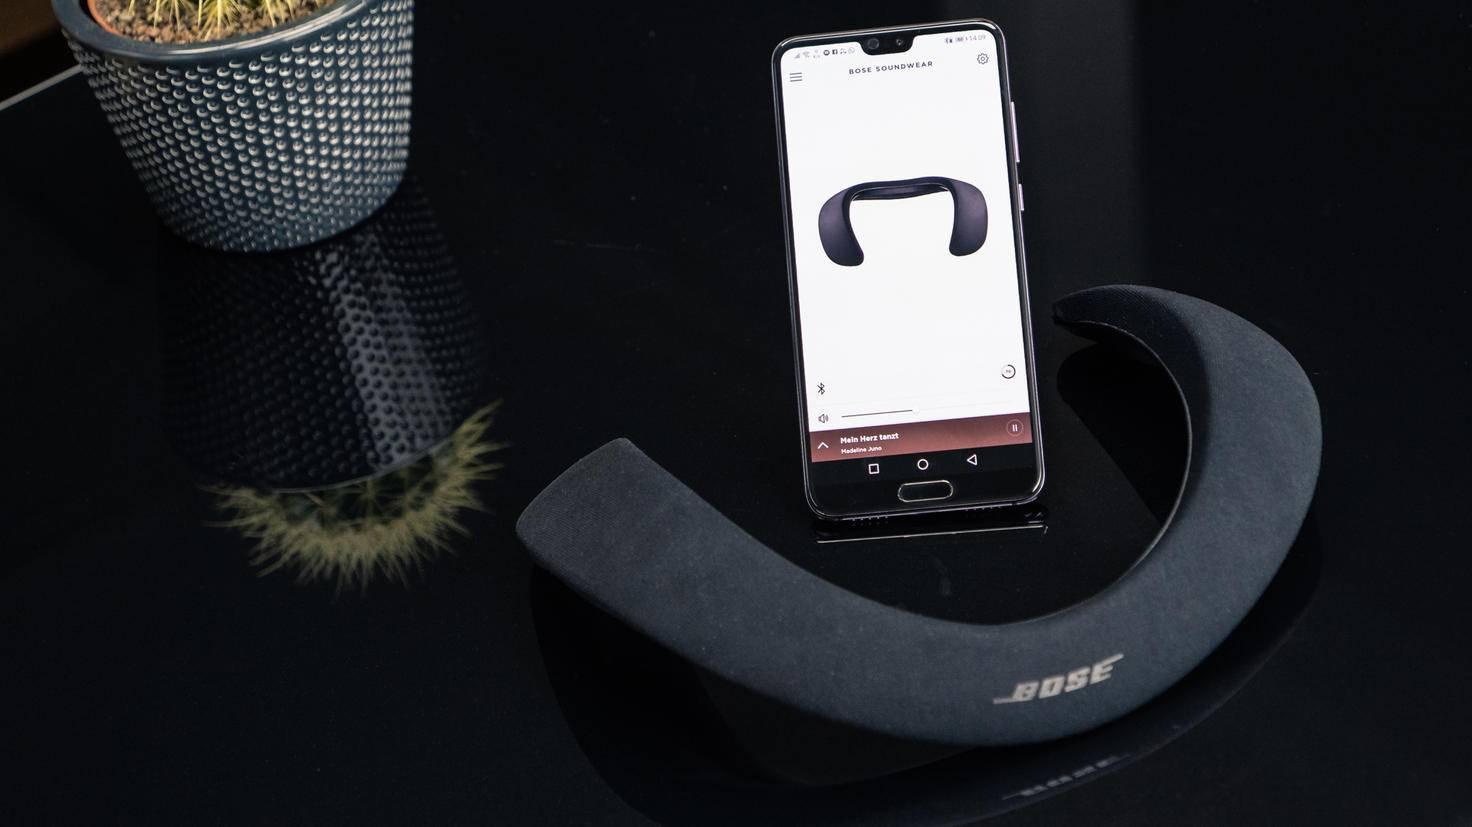 Bose-SoundWear-Companion-TURN-ON-5